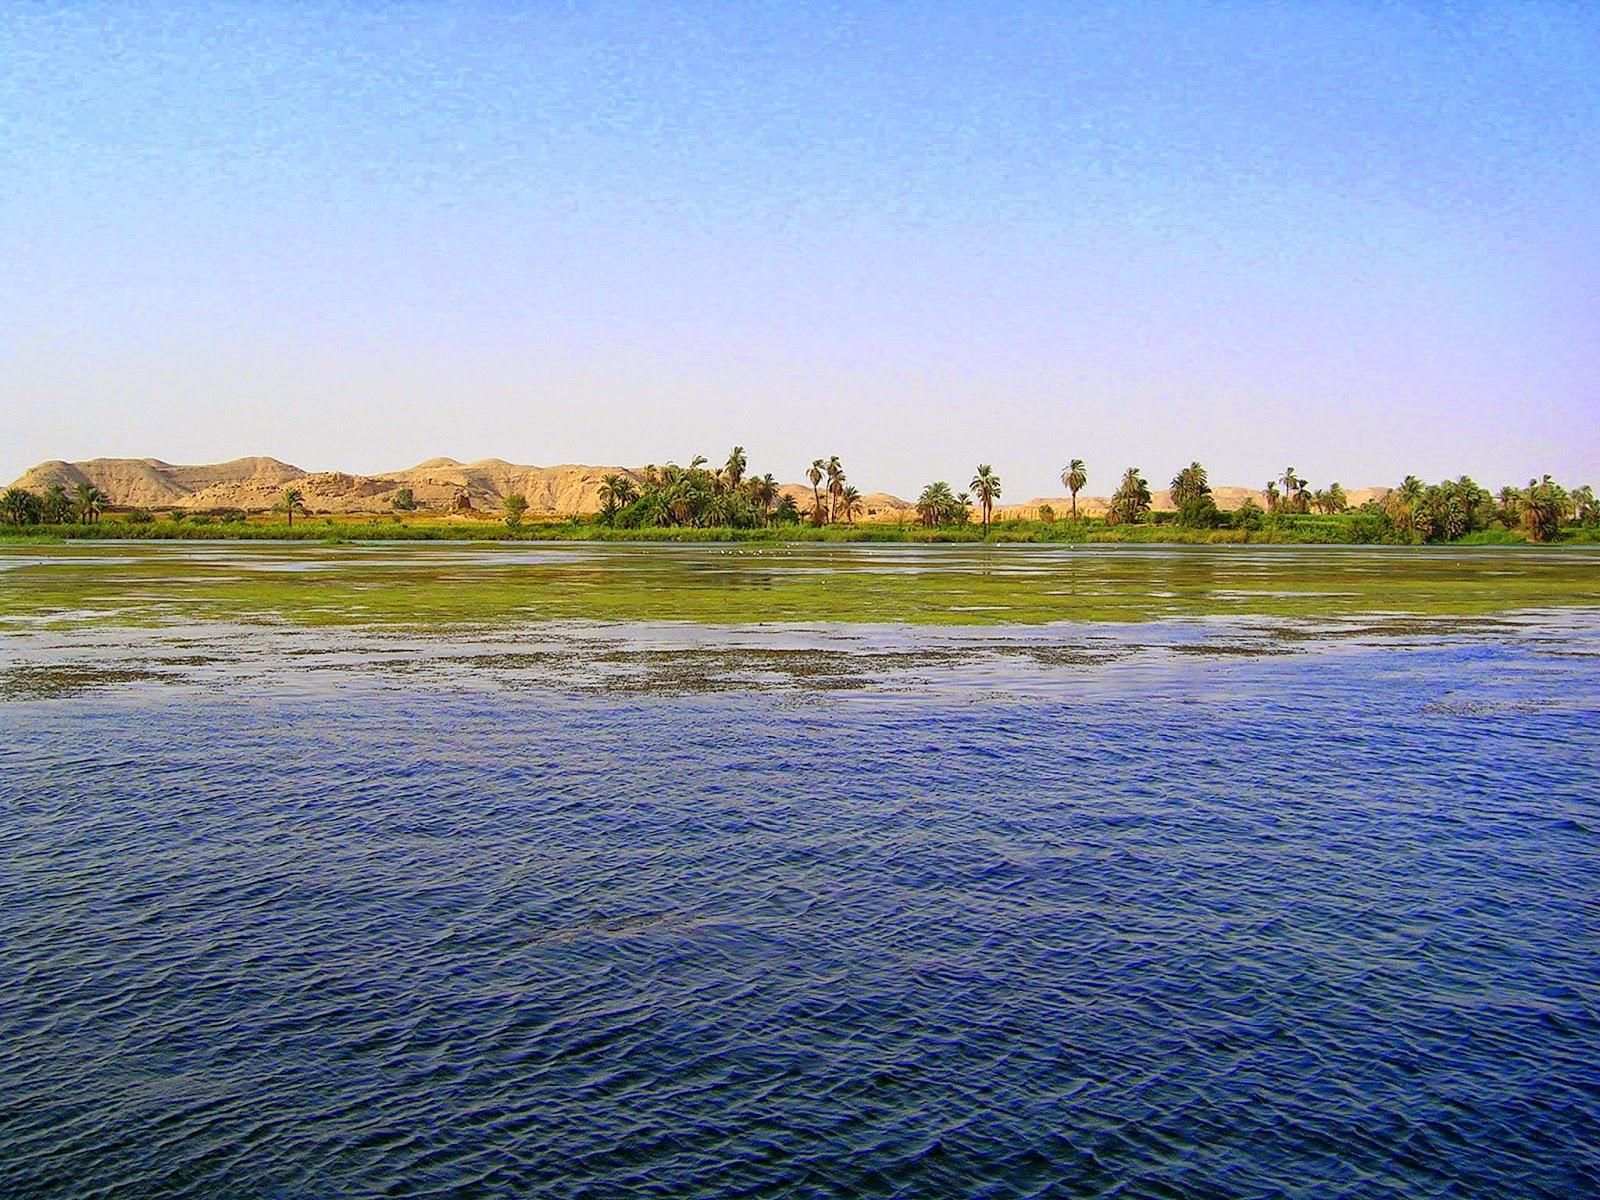 Foto Viajes en Dahabiyyas 5